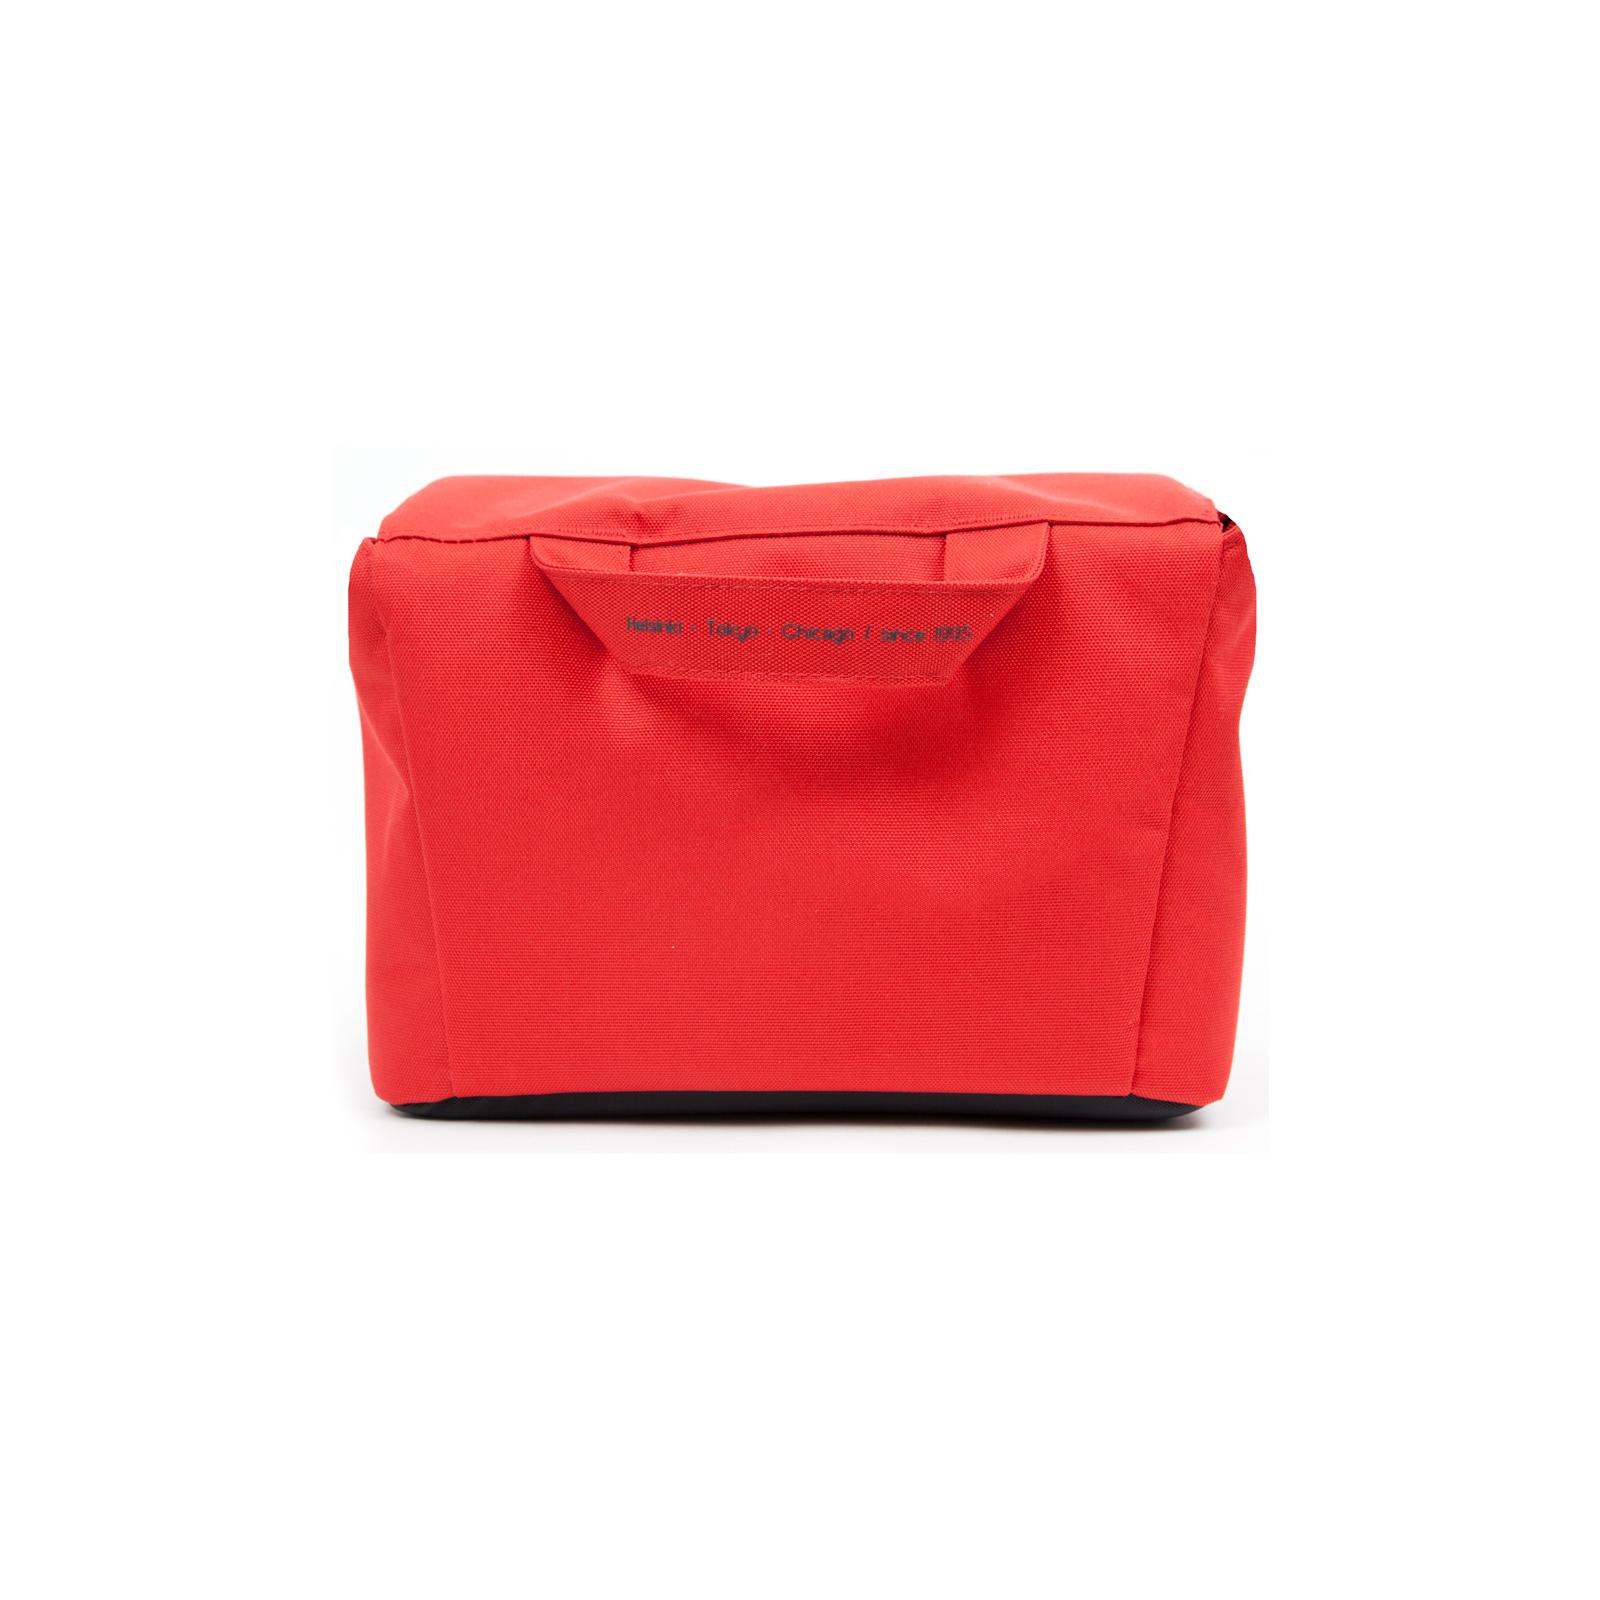 Фото-сумка Golla CAM BAG M Mico PVC/polyester /red (G1371) изображение 2